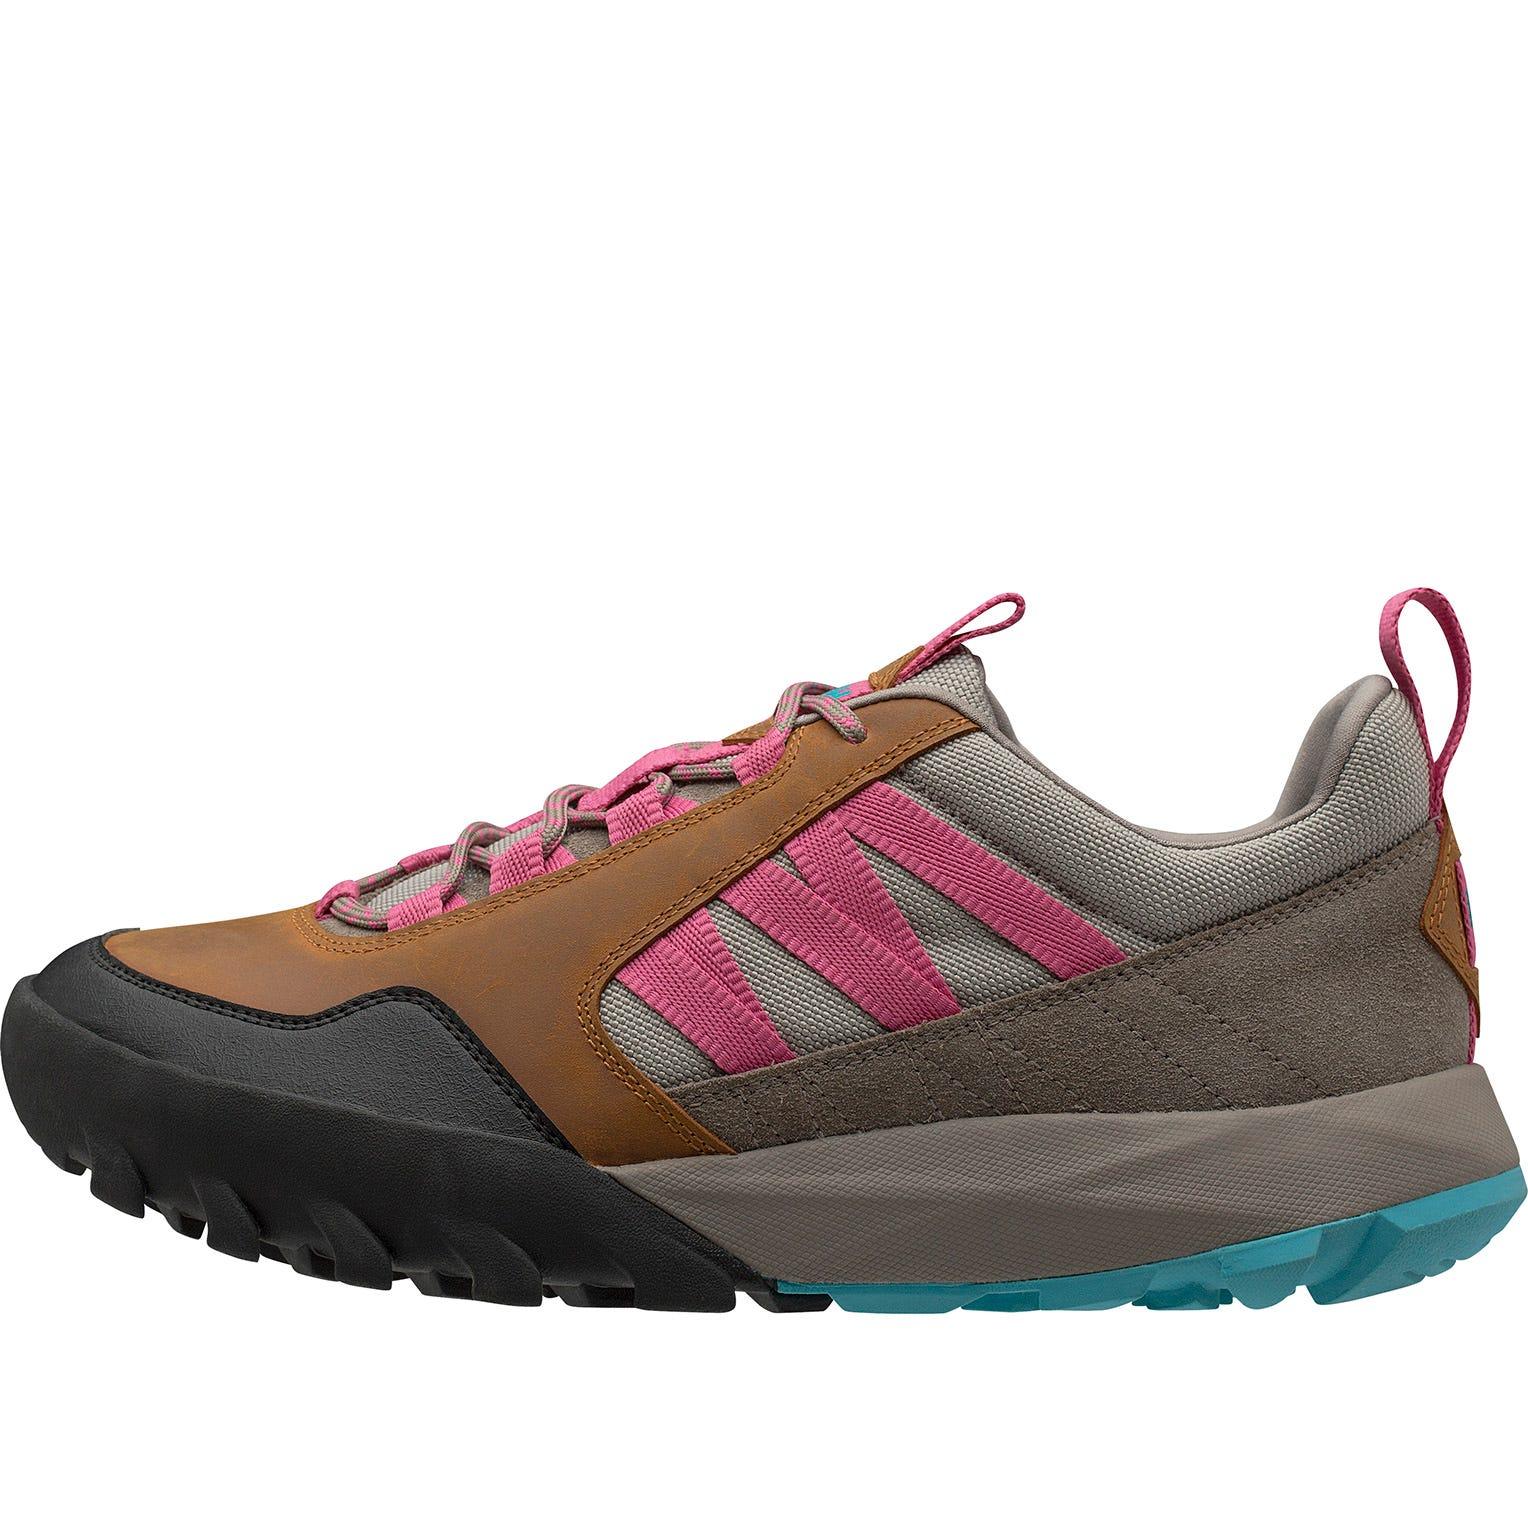 Helly Hansen W Loke Bowron Leather Womens Hiking Boot Brown 37/6